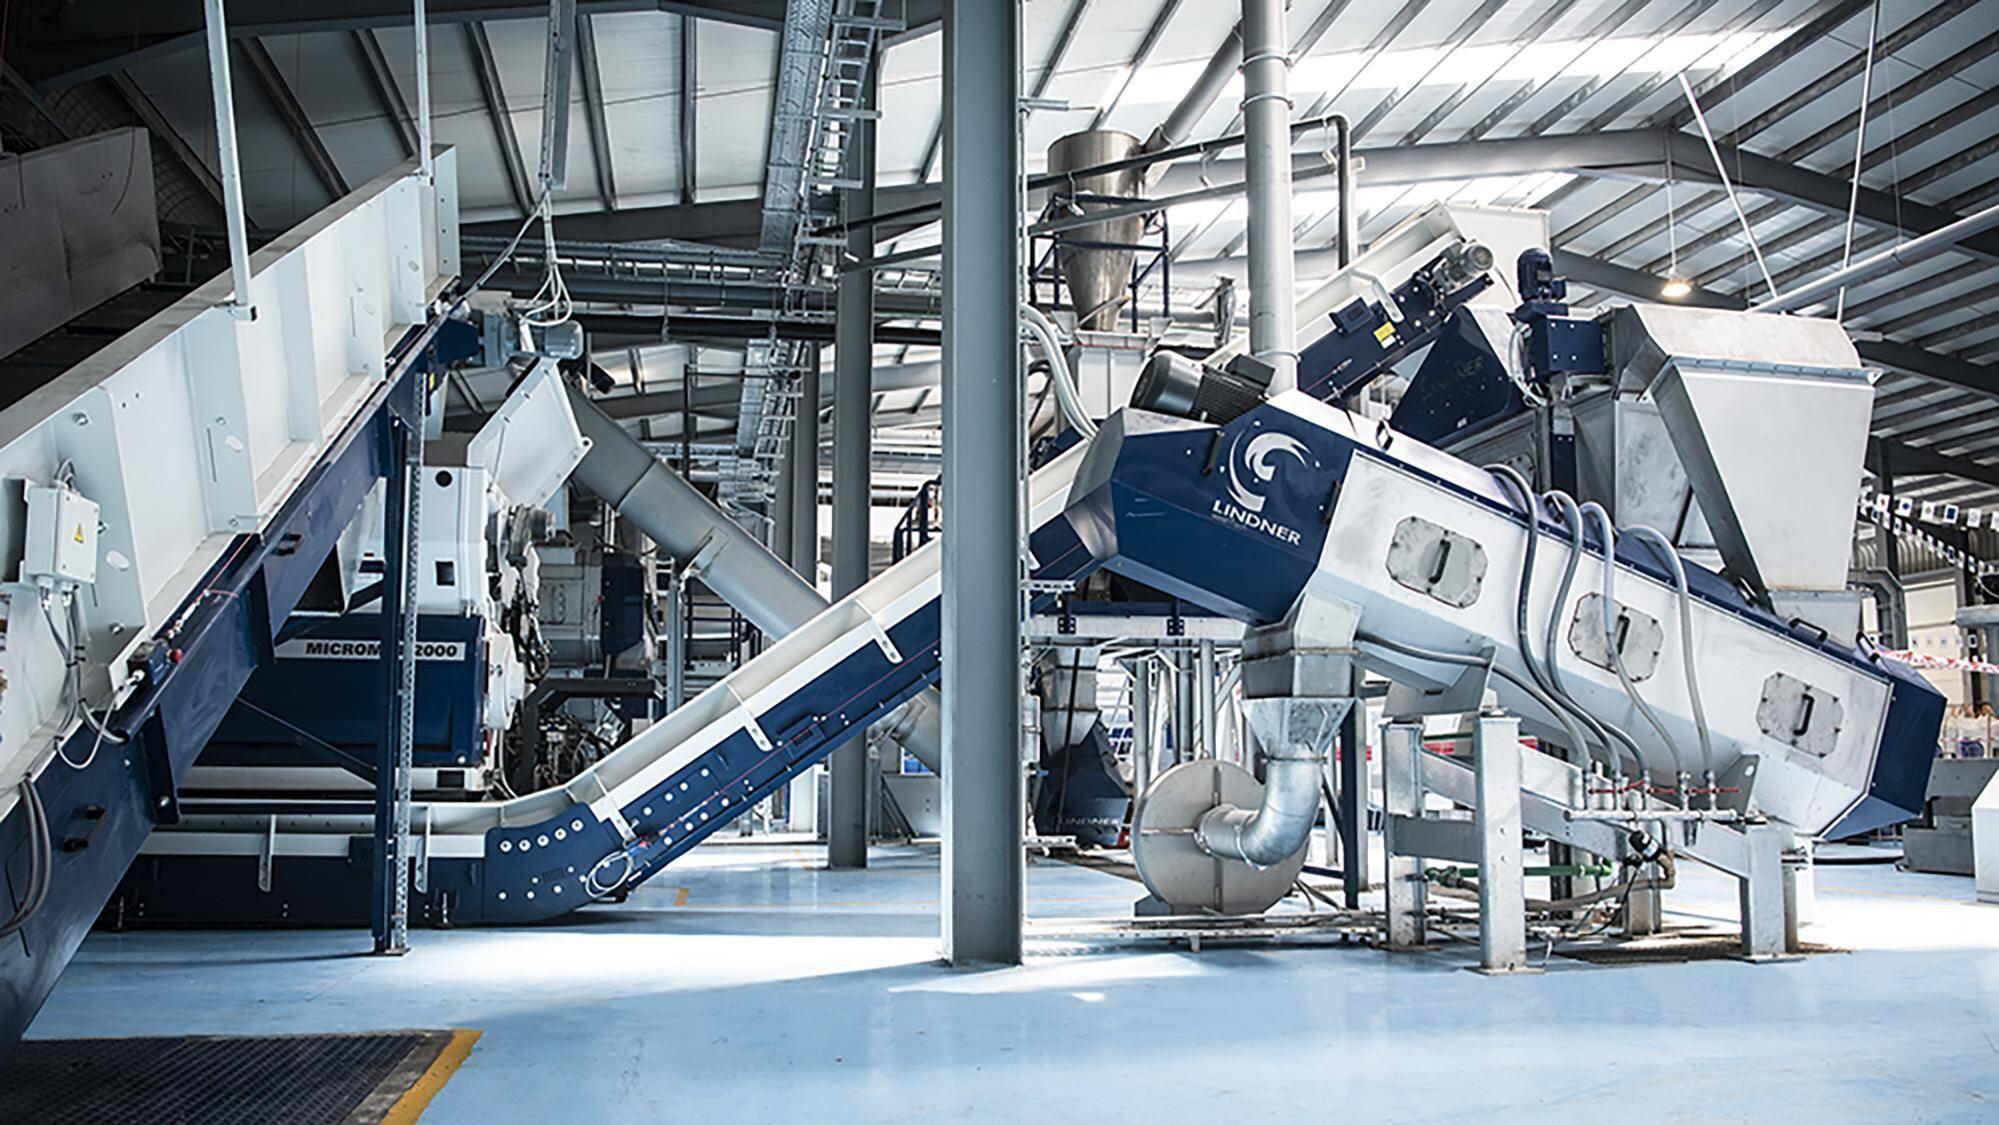 Gallery image 2 - System solution plastics recycling: shredding, washing, sorting